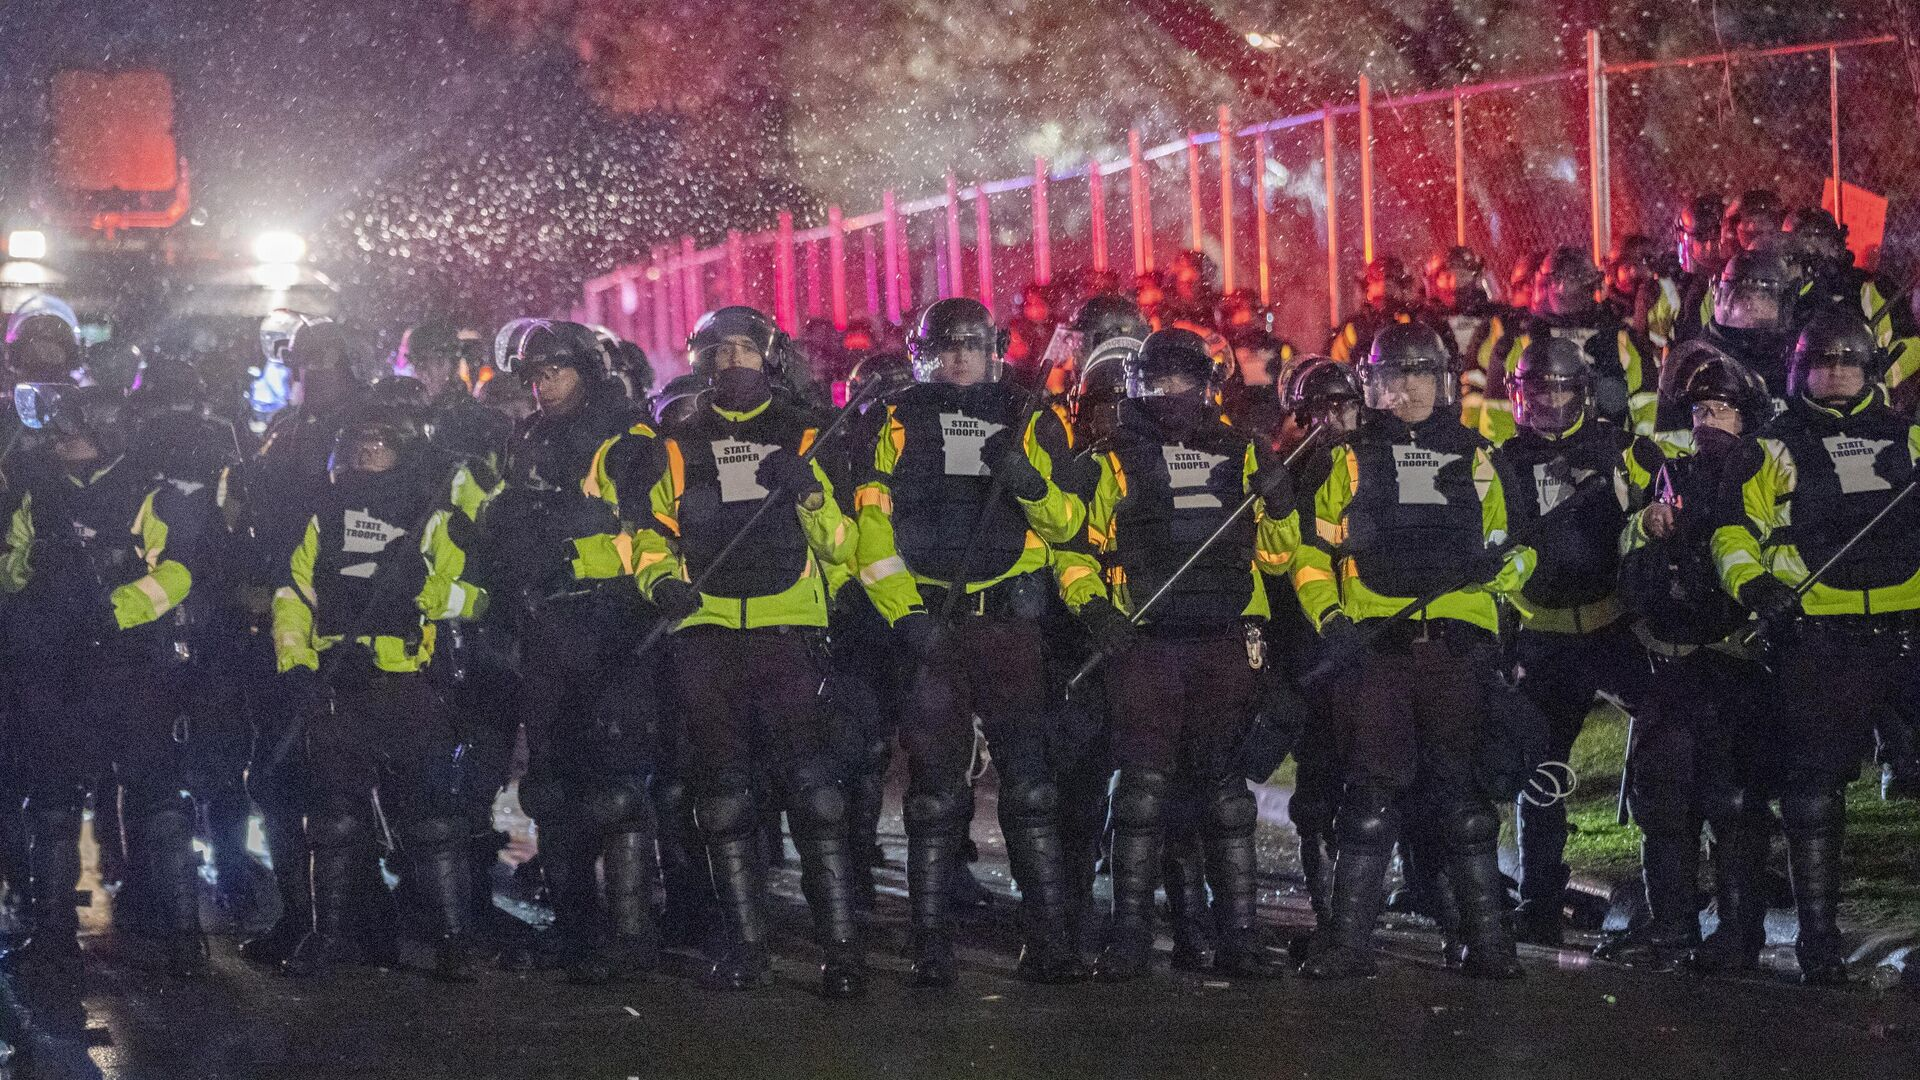 Сотрудники полиции во время акции протеста в городе Бруклин-Сентер в штате Миннесота - РИА Новости, 1920, 17.04.2021